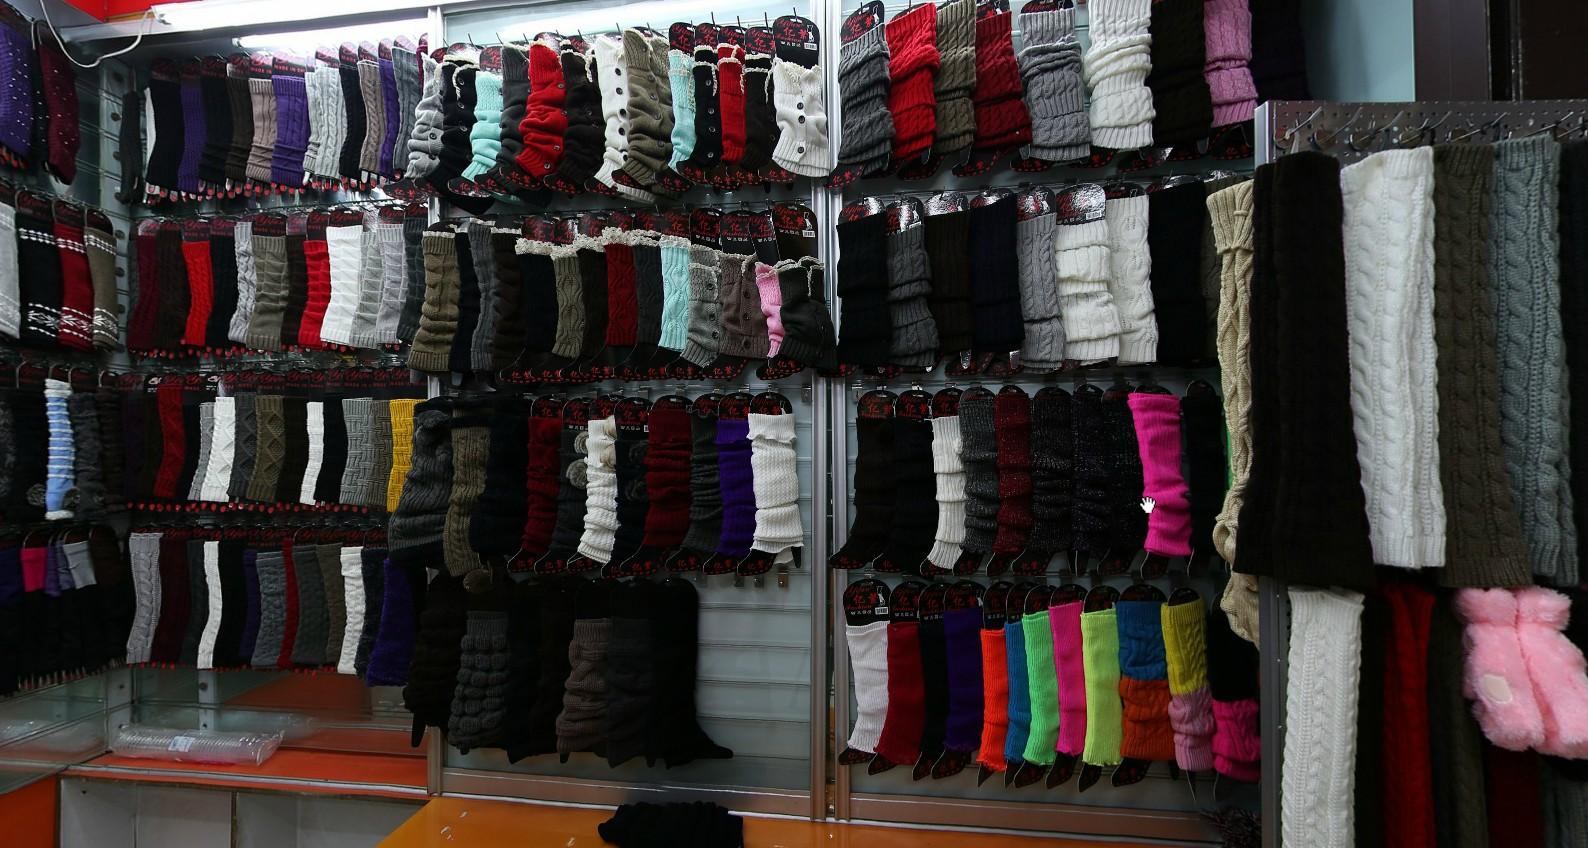 Bahan Katun Lucu Wanita Di Atas Lutut Tinggi Kaus Kaki Musim Dingin Kaki Hangat